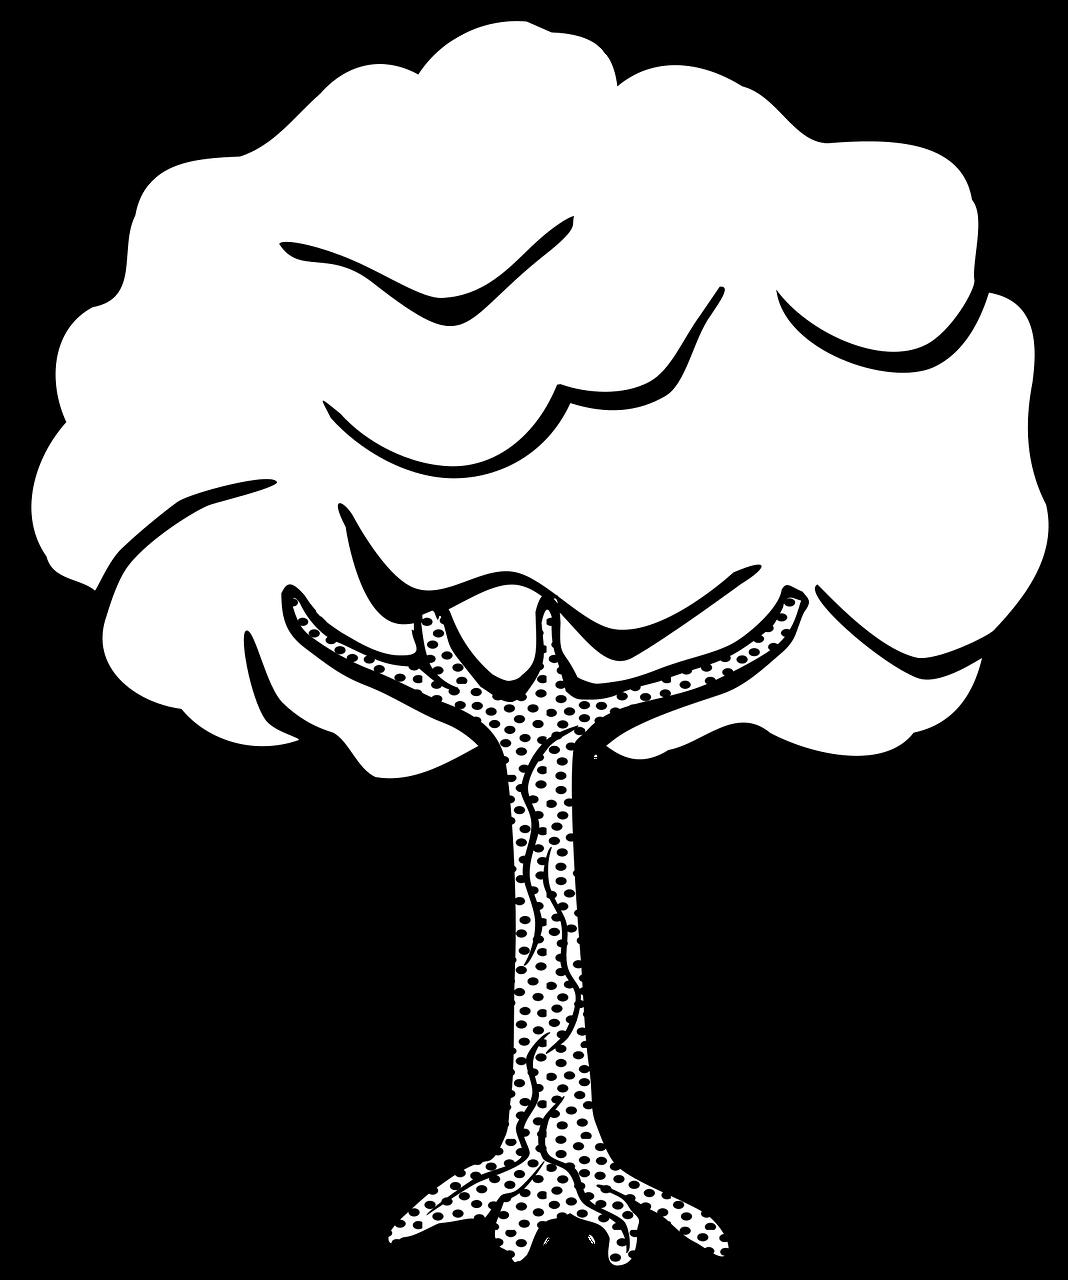 Дерево контур картинка